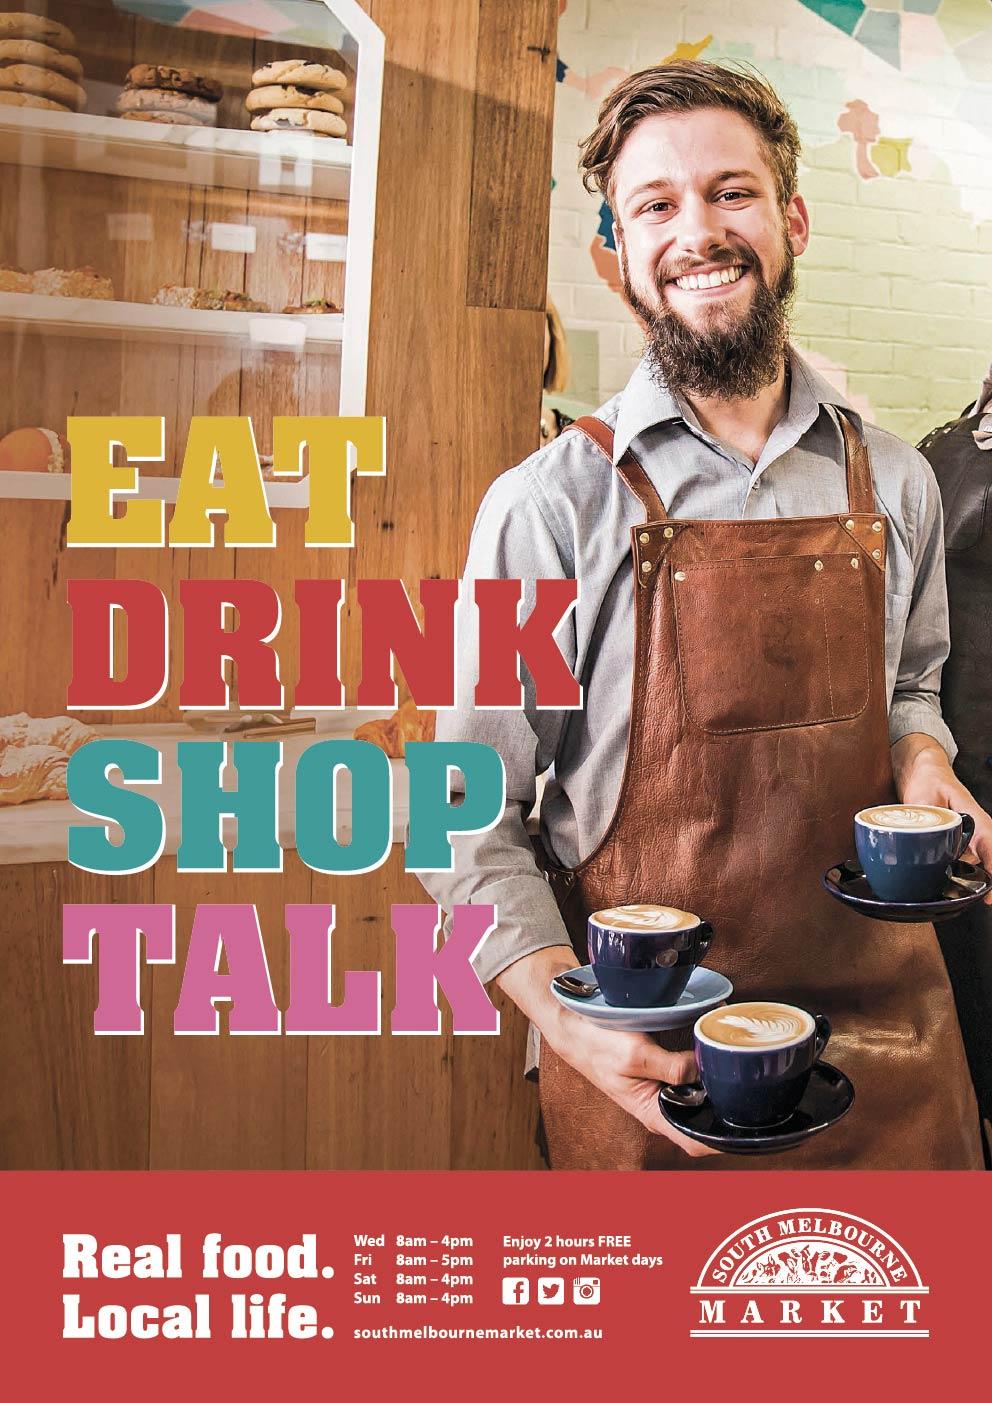 Eat Drink Talk Shop